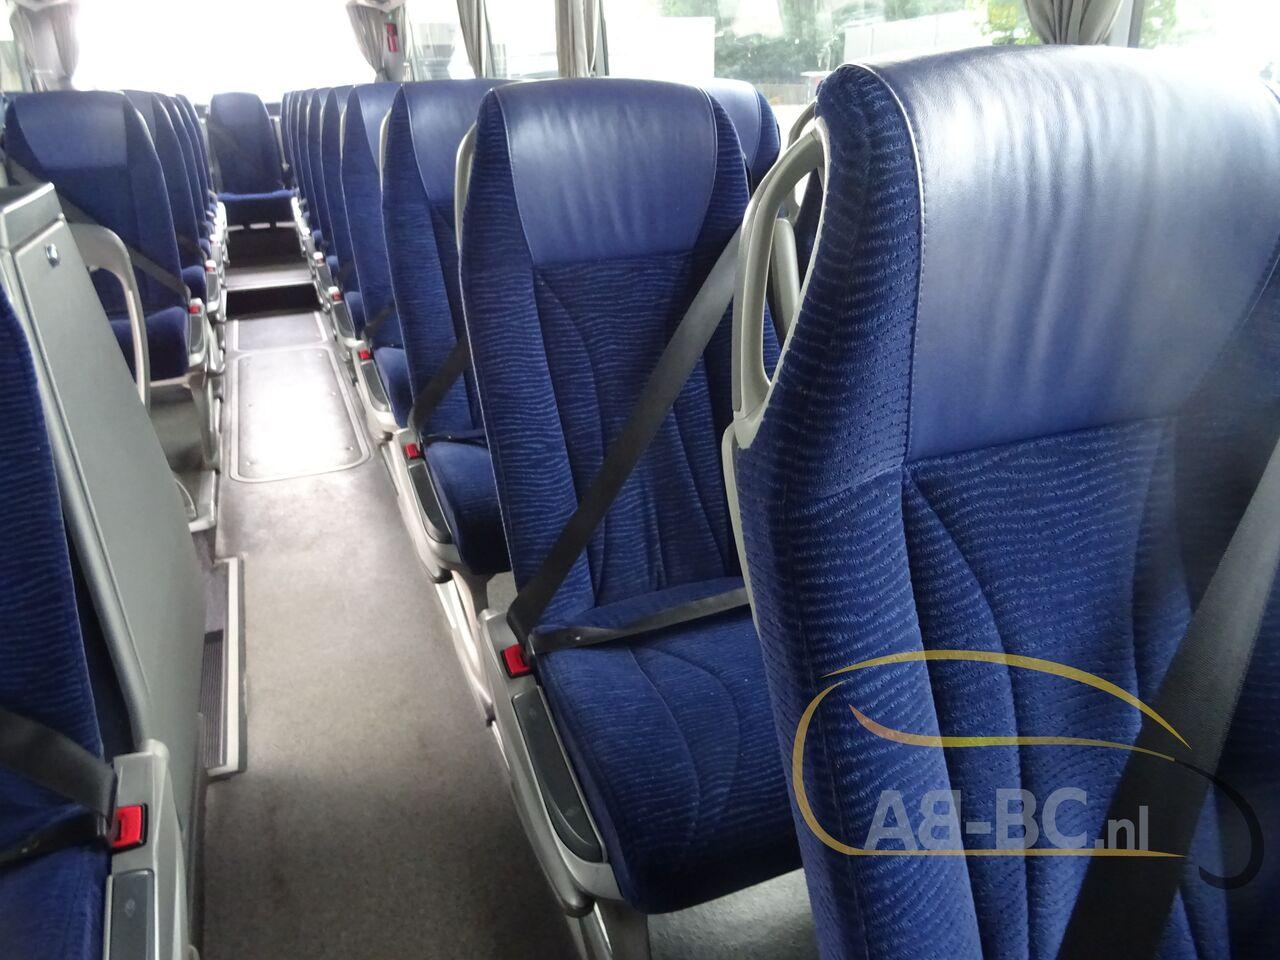 coach-busSETRA-S415-GT-HD-FINAL-EDITION---1627457230724691217_big_ee8d53e49c66f0f40a3e295280aac6f3--21050713010665719300